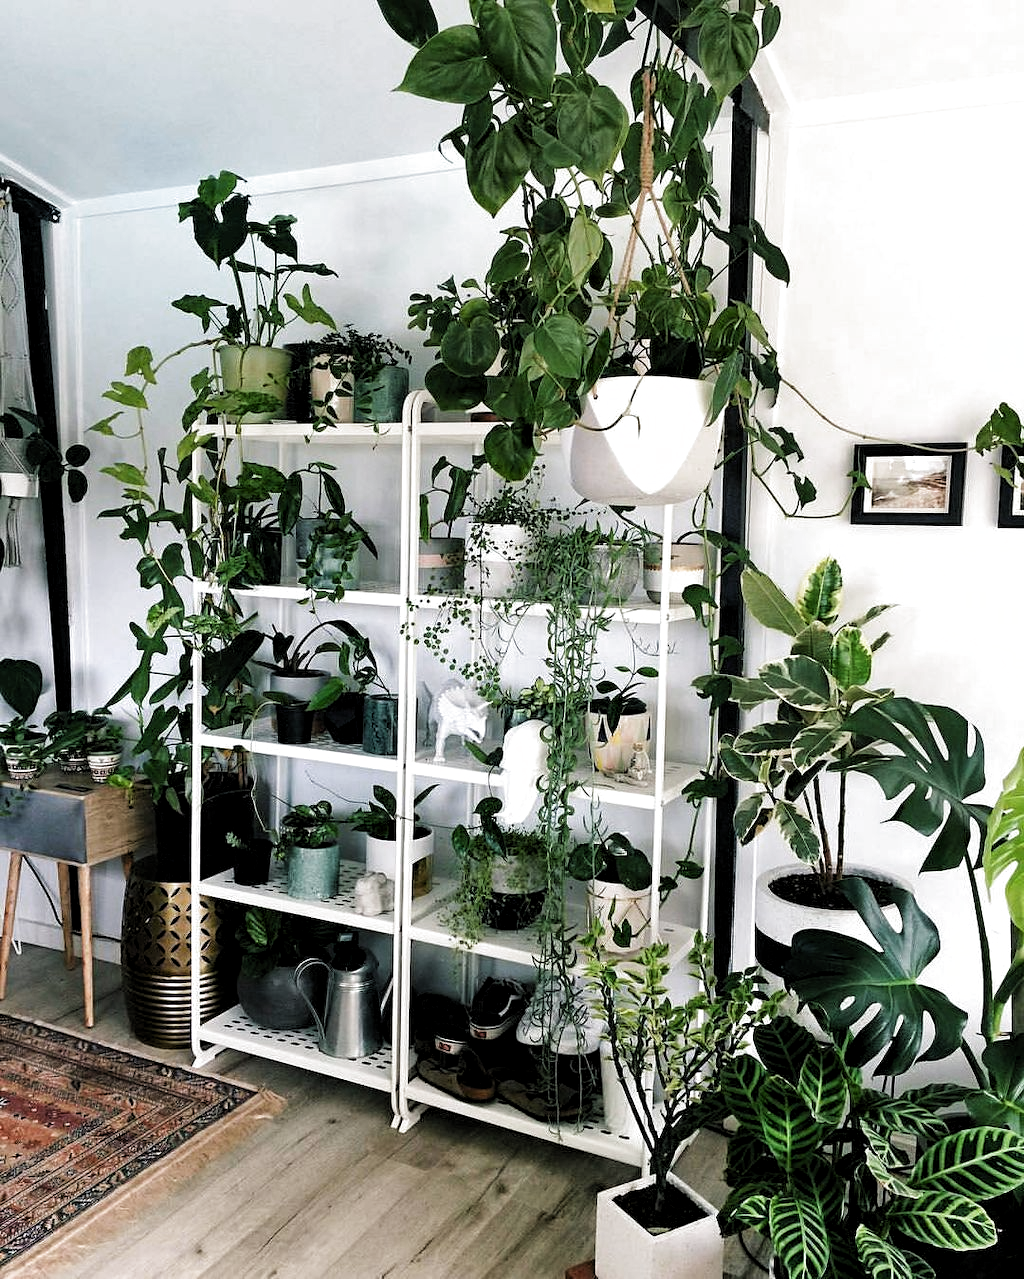 Living Room Plants Shelves - 8+ Greeny Indoor Plants Ideas Will